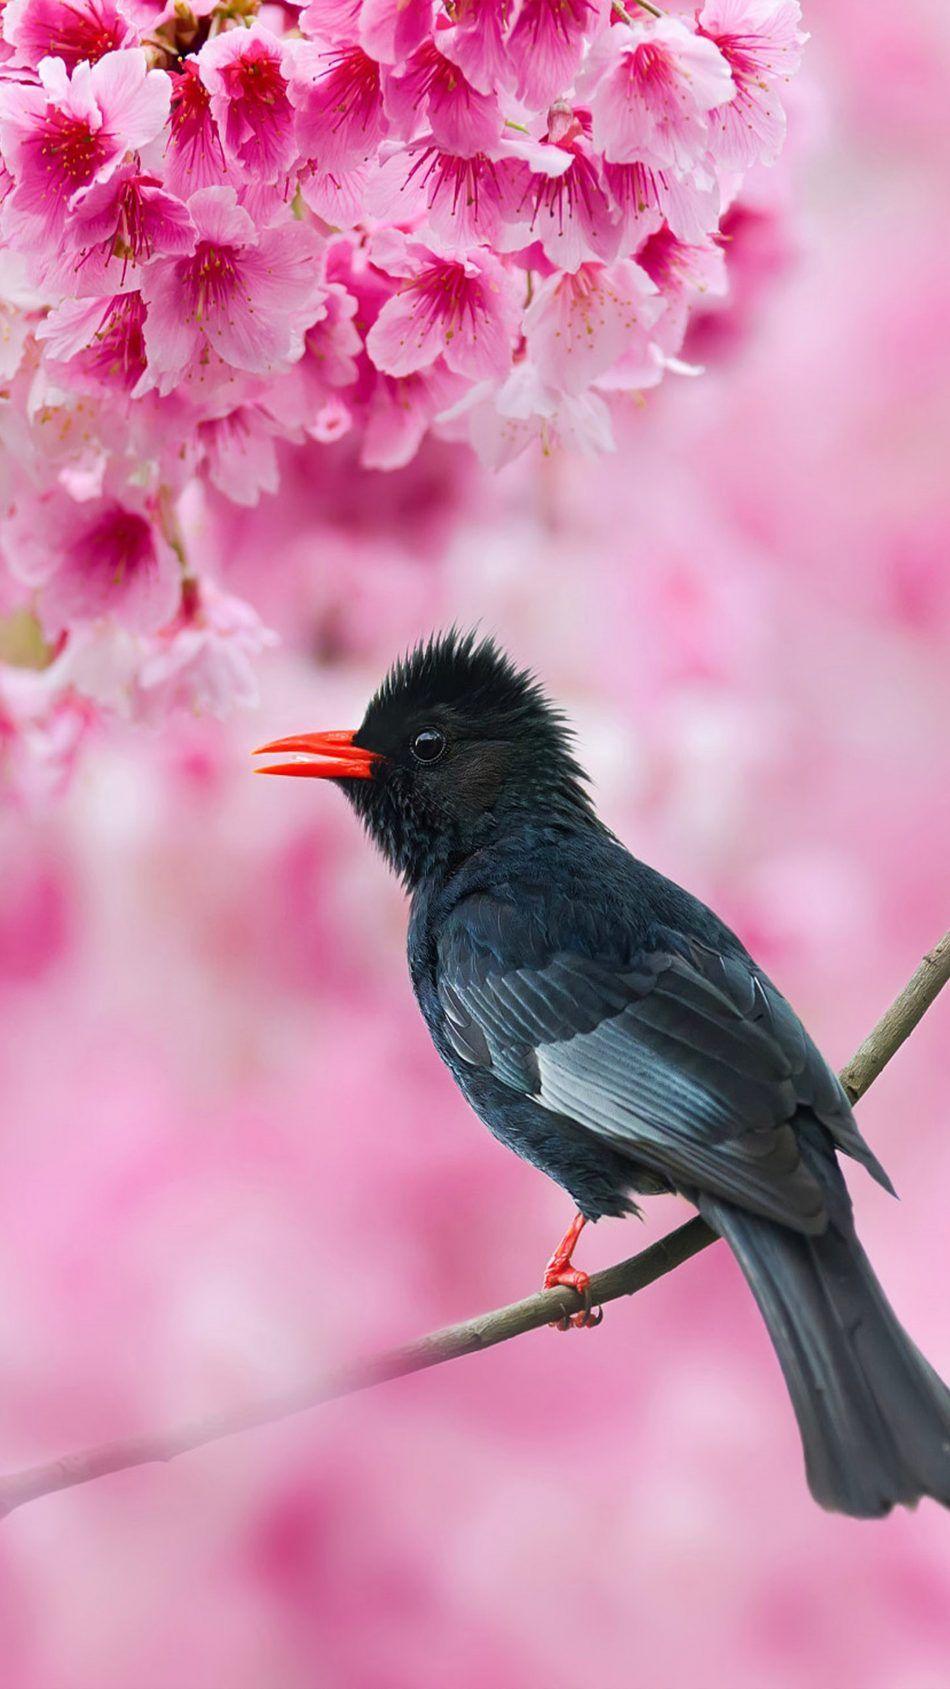 Black Bulbul Sakura Tree Pink Flowers 4k Ultra Hd Mobile Wallpaper Bird Wallpaper Sakura Tree Pet Birds